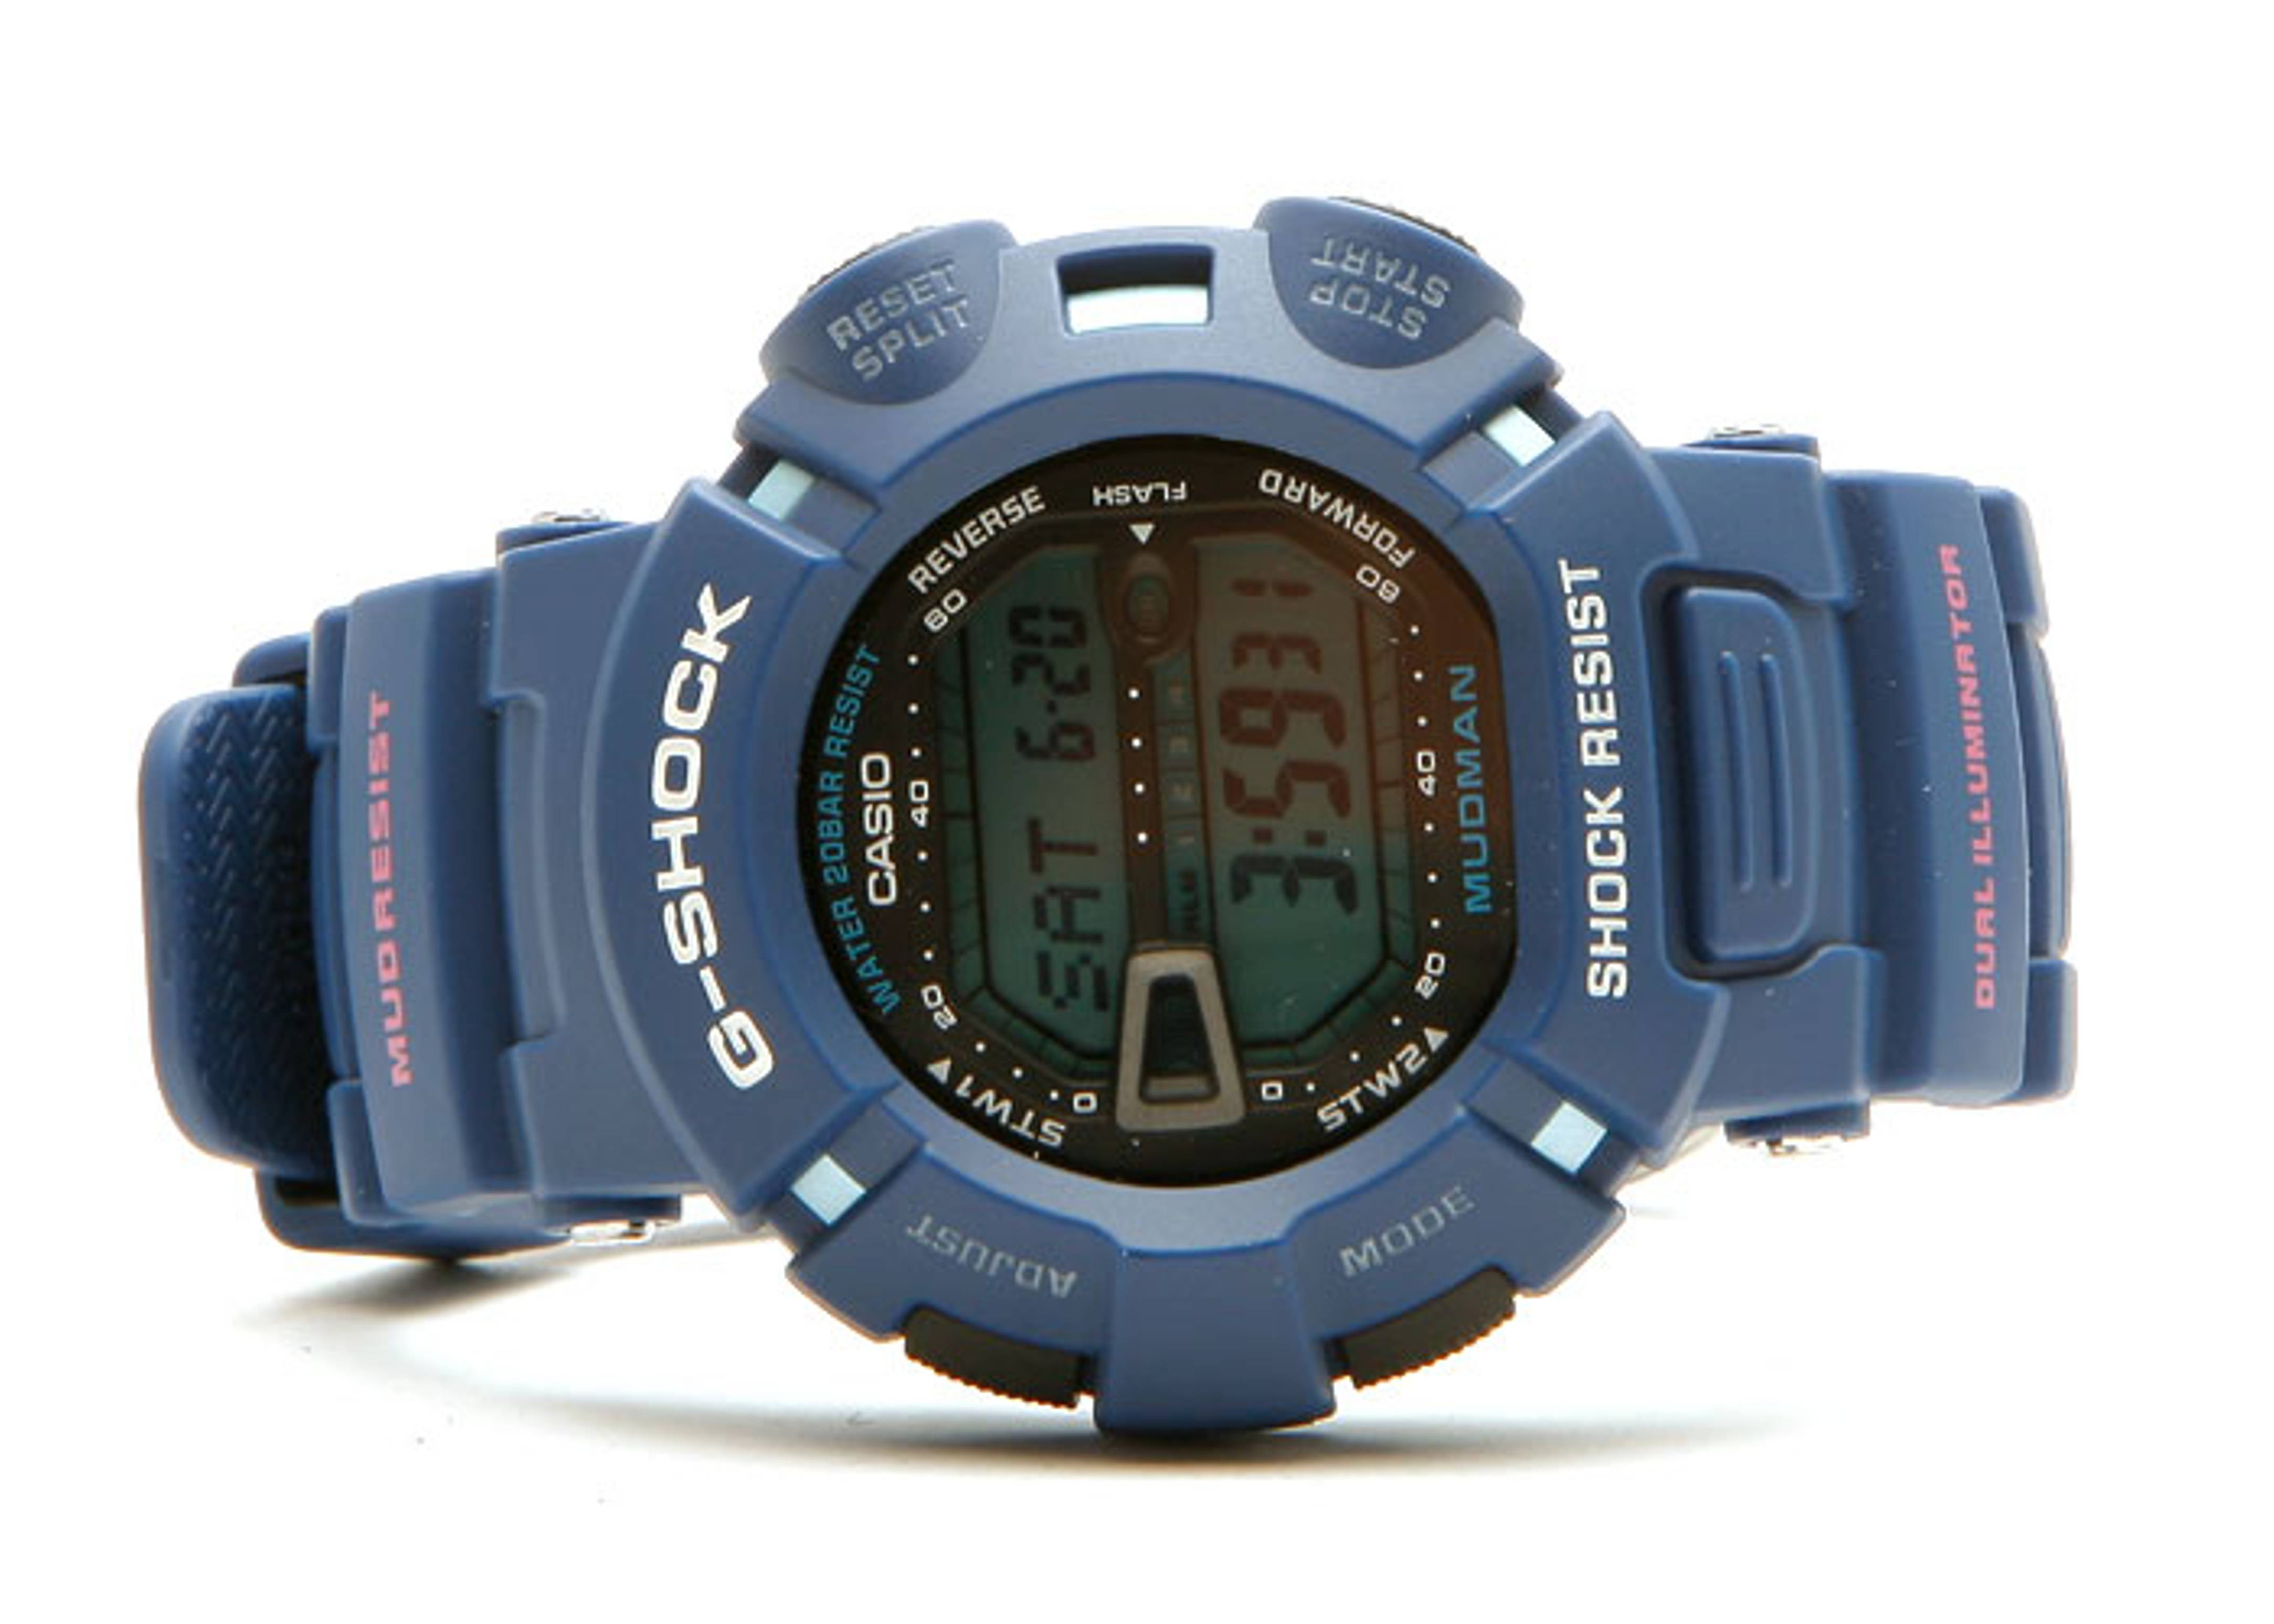 g-shock g9000mx2cr